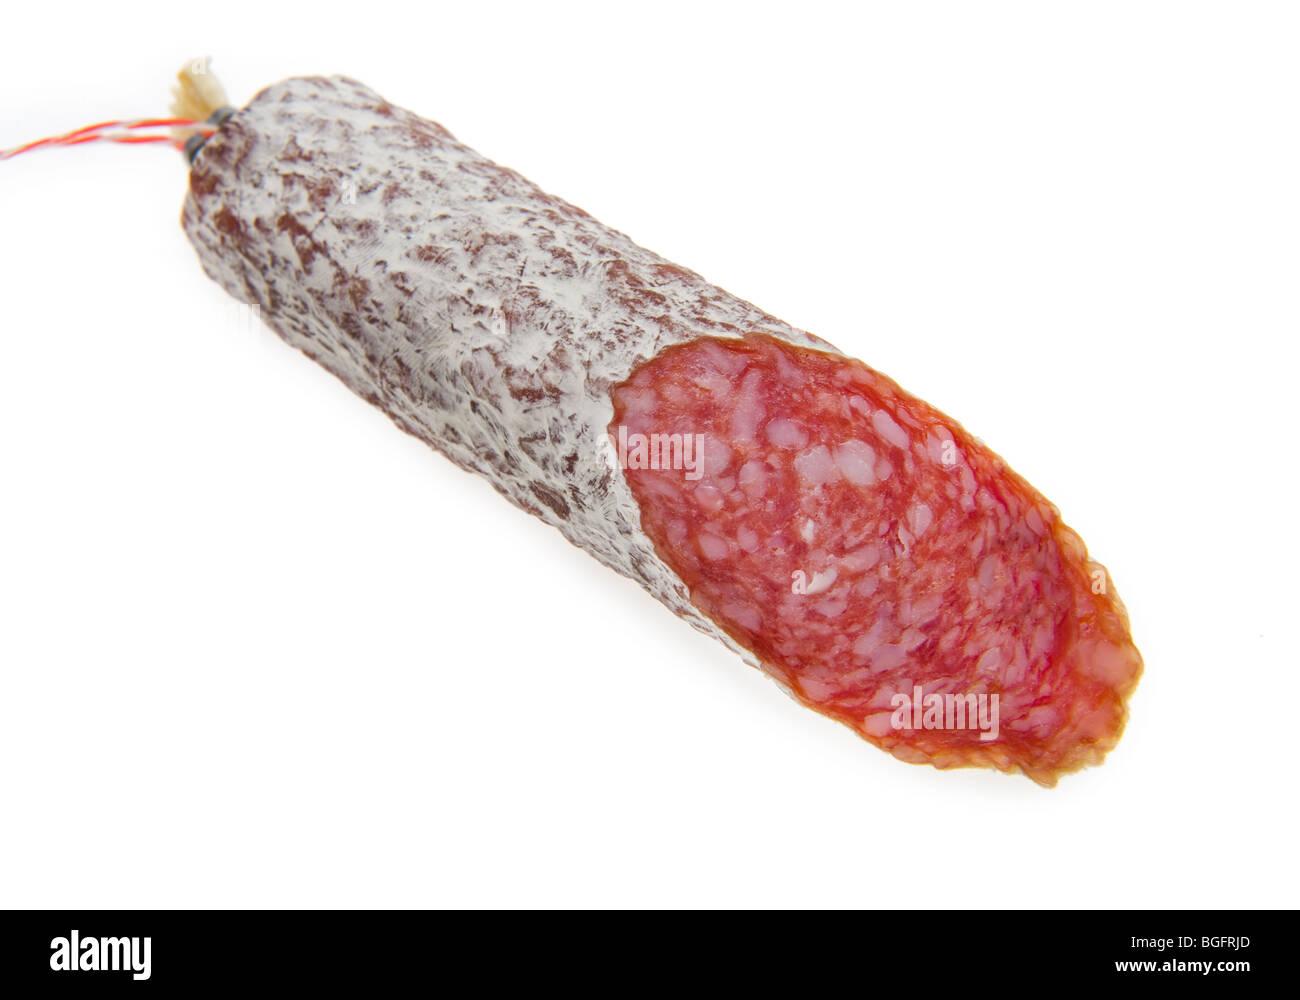 italian italy salami sausage cured meat pork chorizo salami sausage spain  cookery, cooking, health, healthy, orga - Stock Image